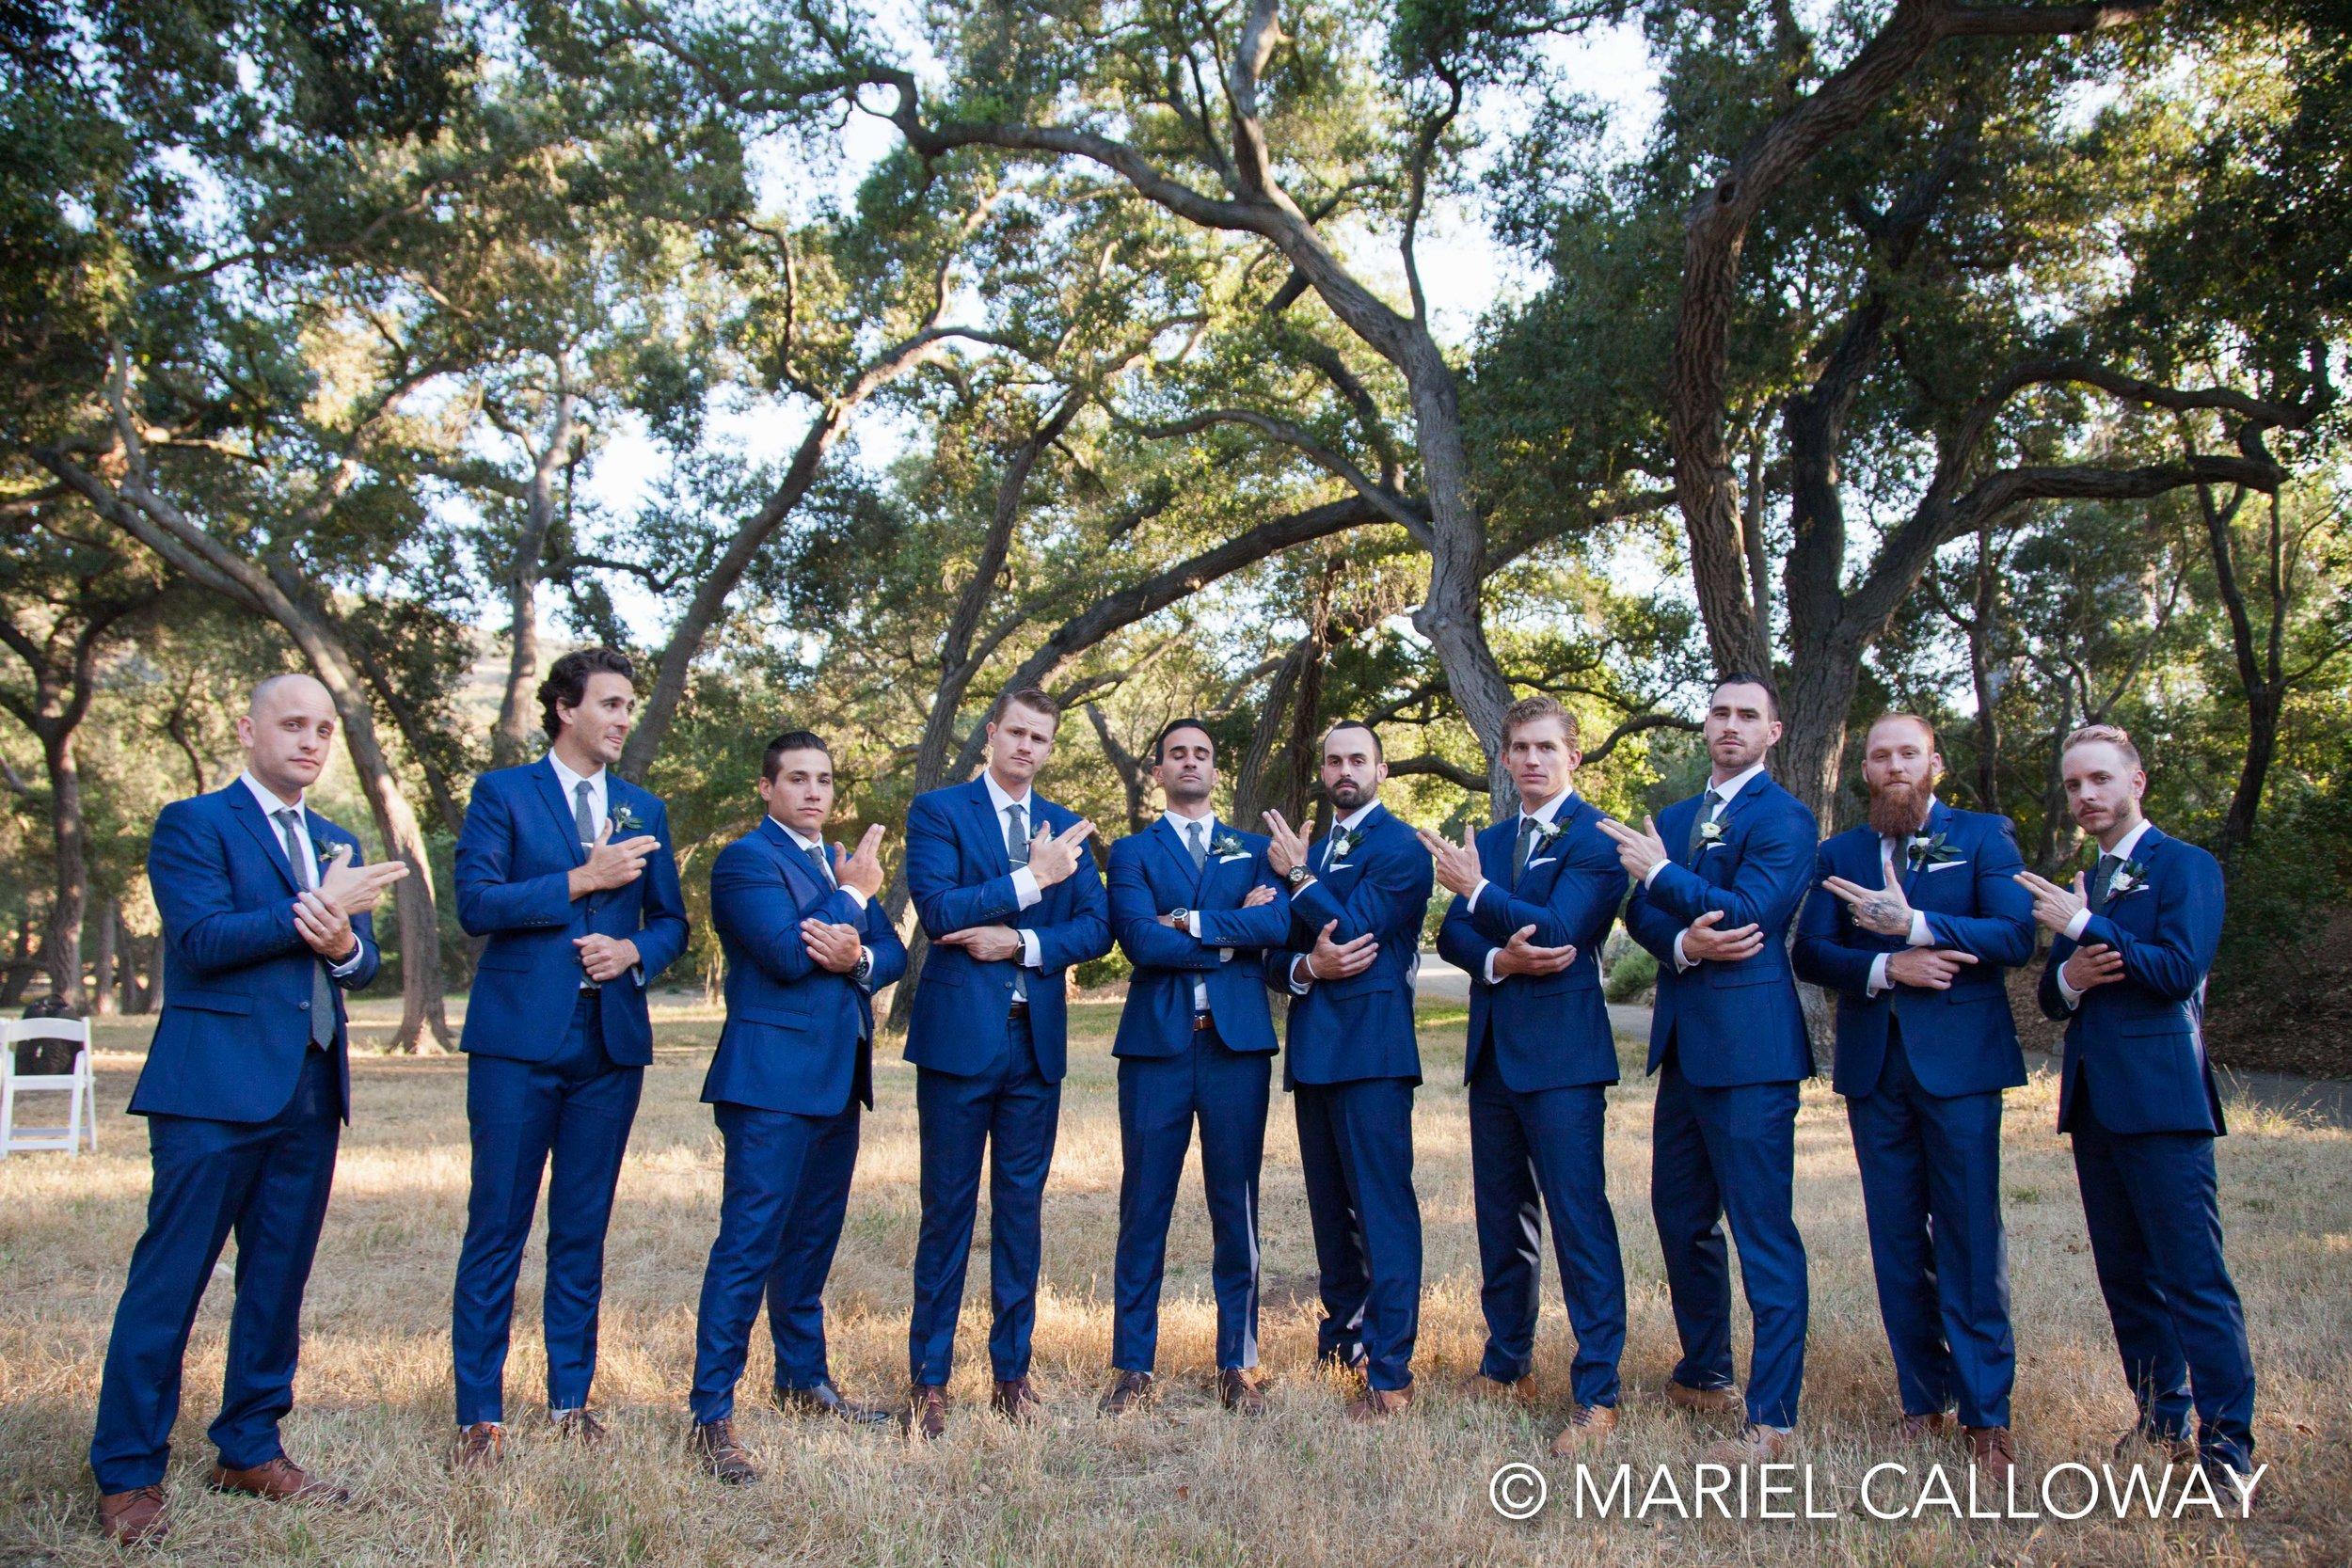 Mariel-Calloway-Los-Angeles-Wedding-Photography-Smith-32.jpg